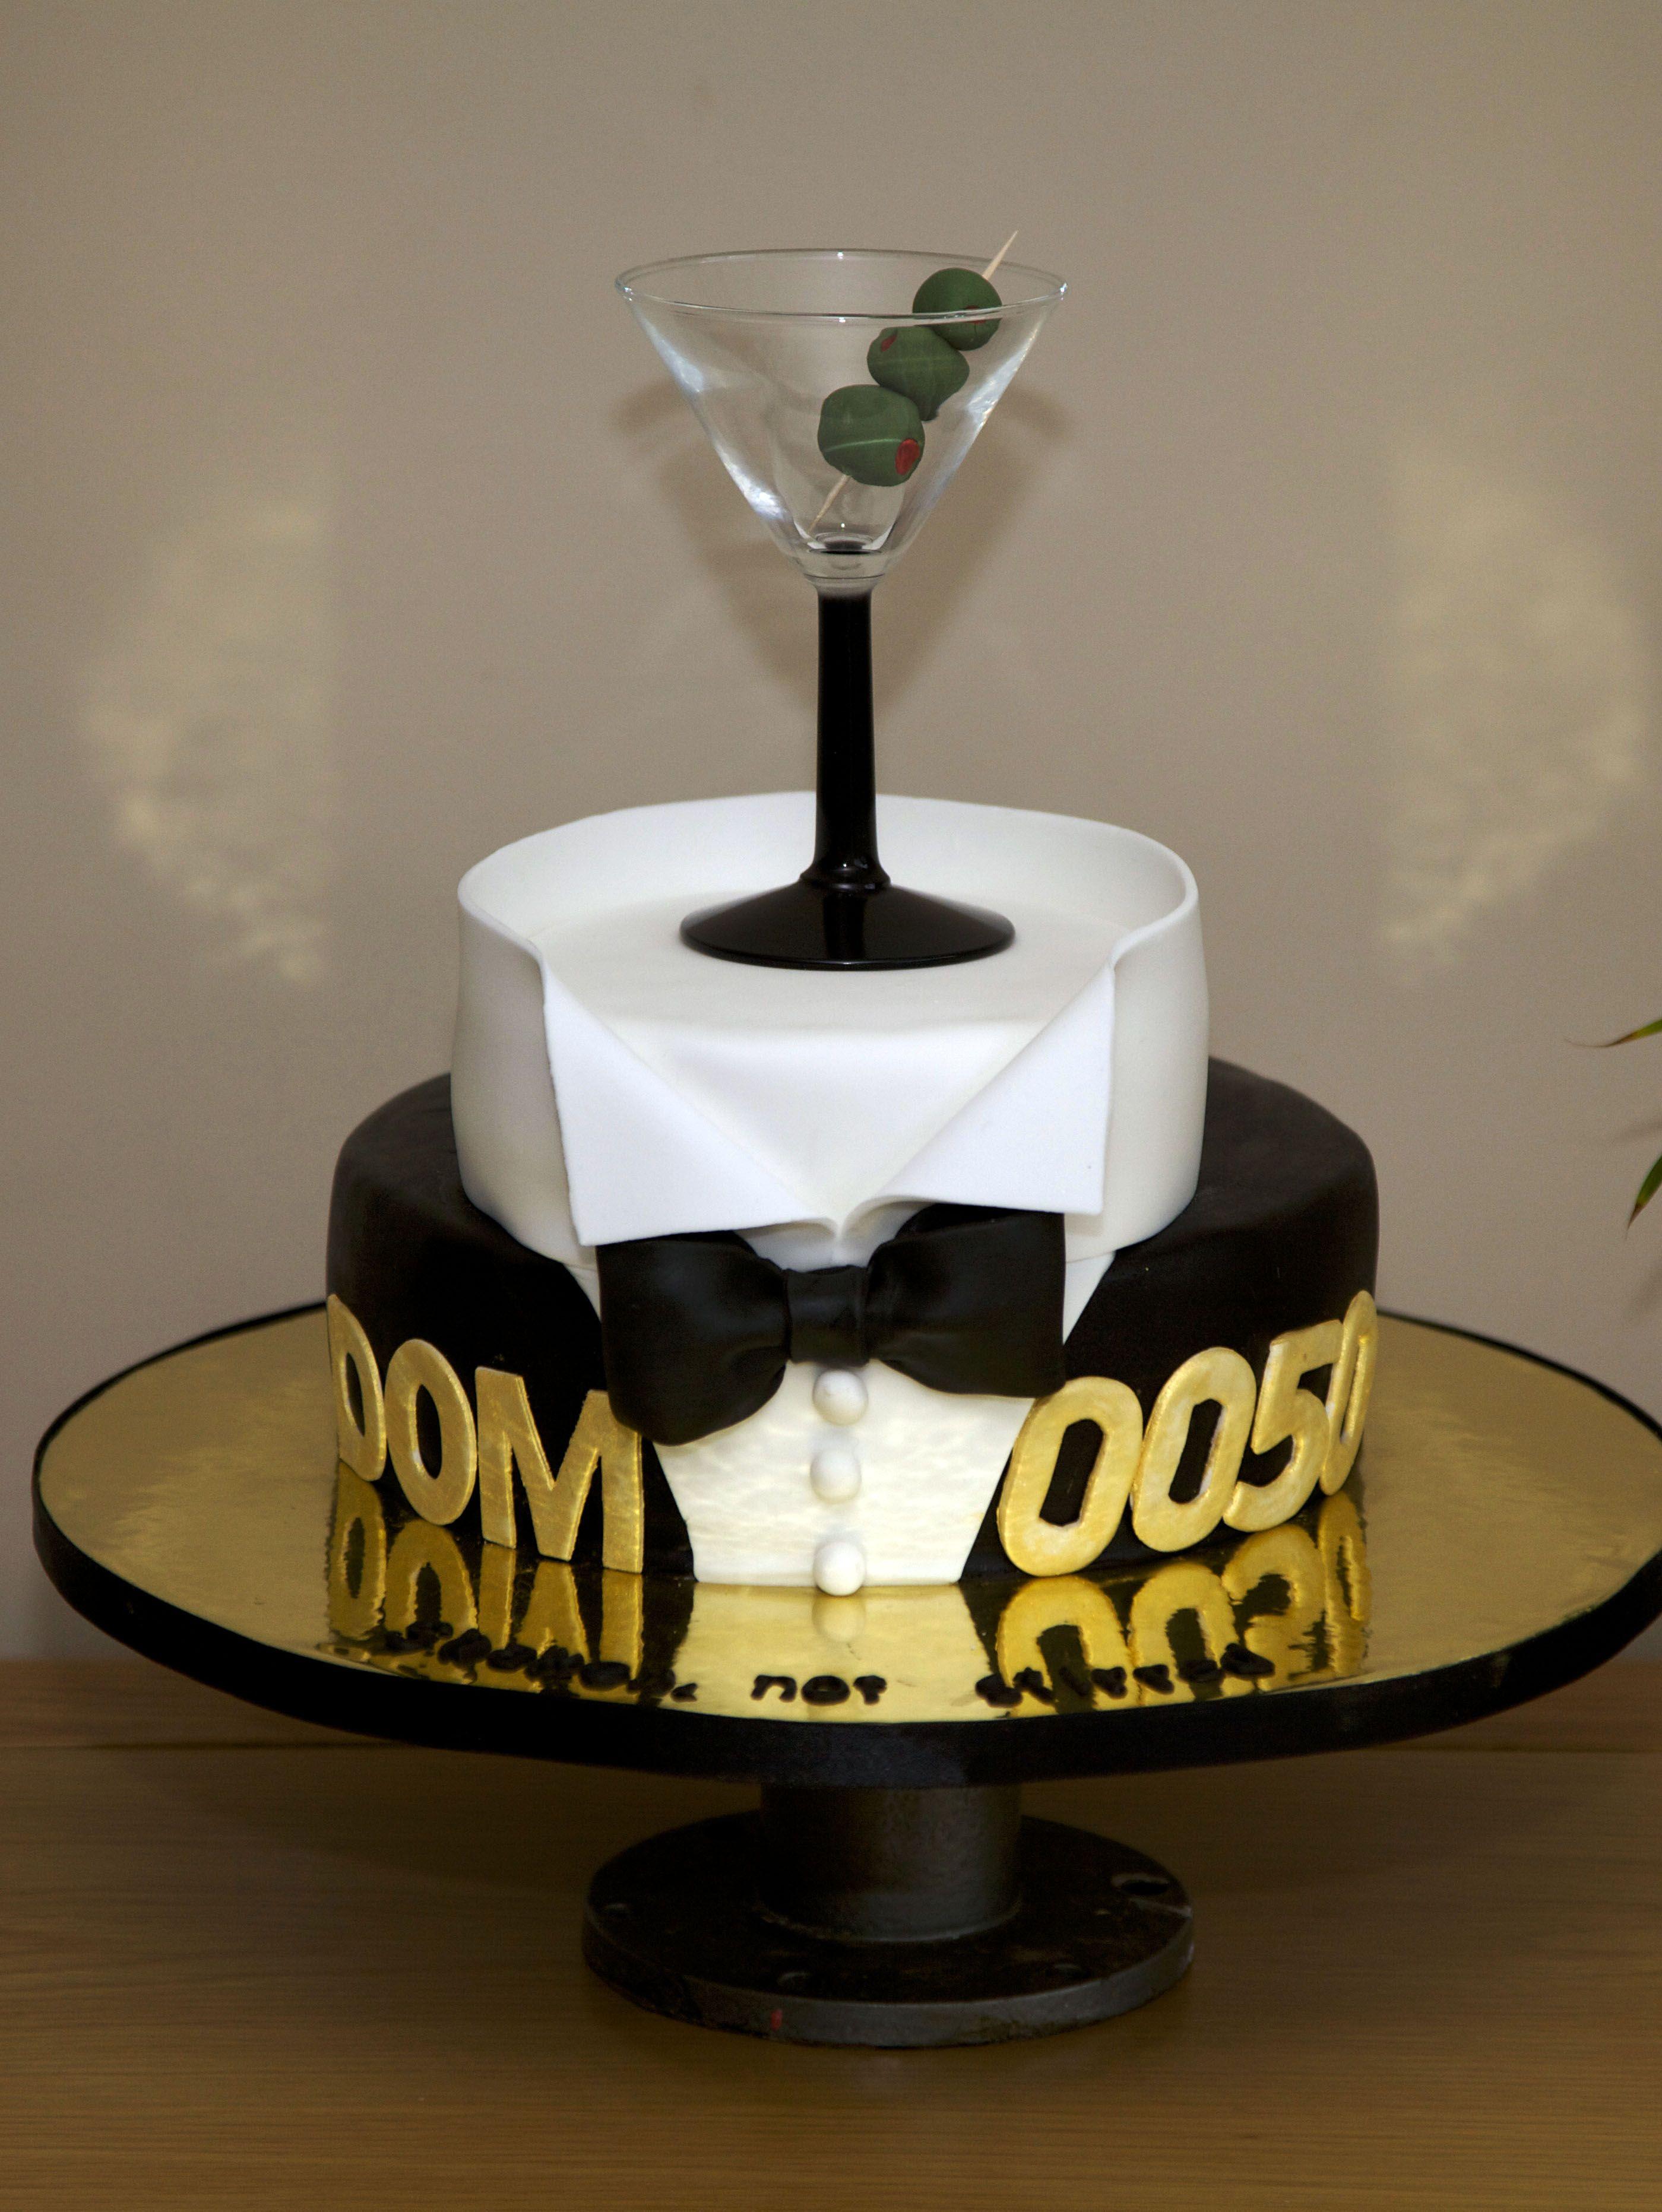 James Bond Cake Cakes Pinterest